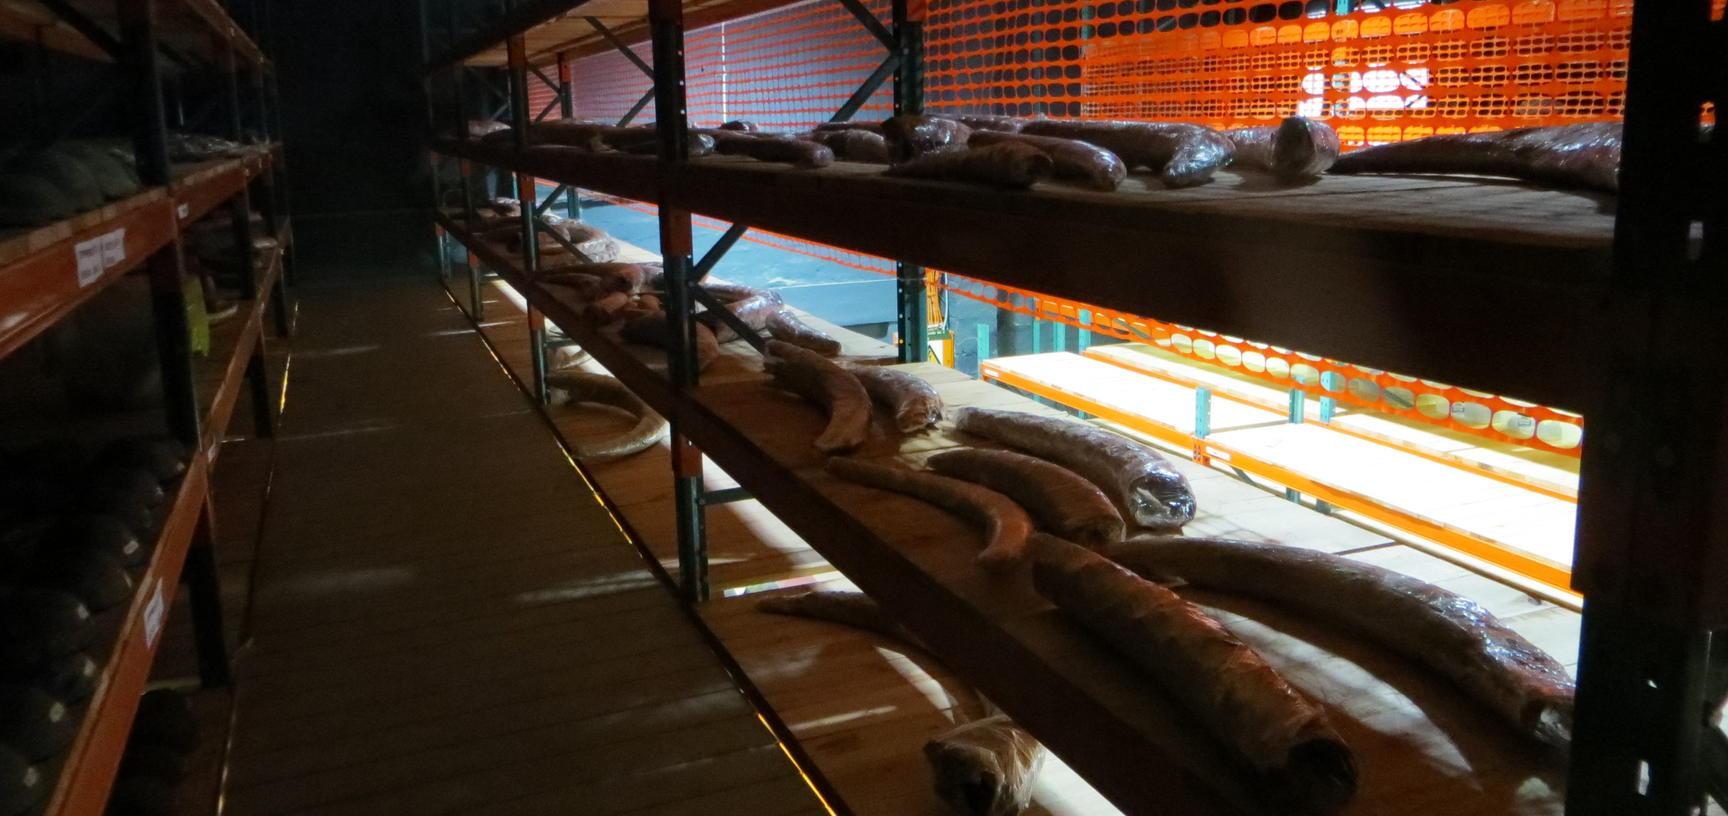 Elephant ivory cargo in the storeroom of the Oranjemund mine. Photo by: Ashley Coutu